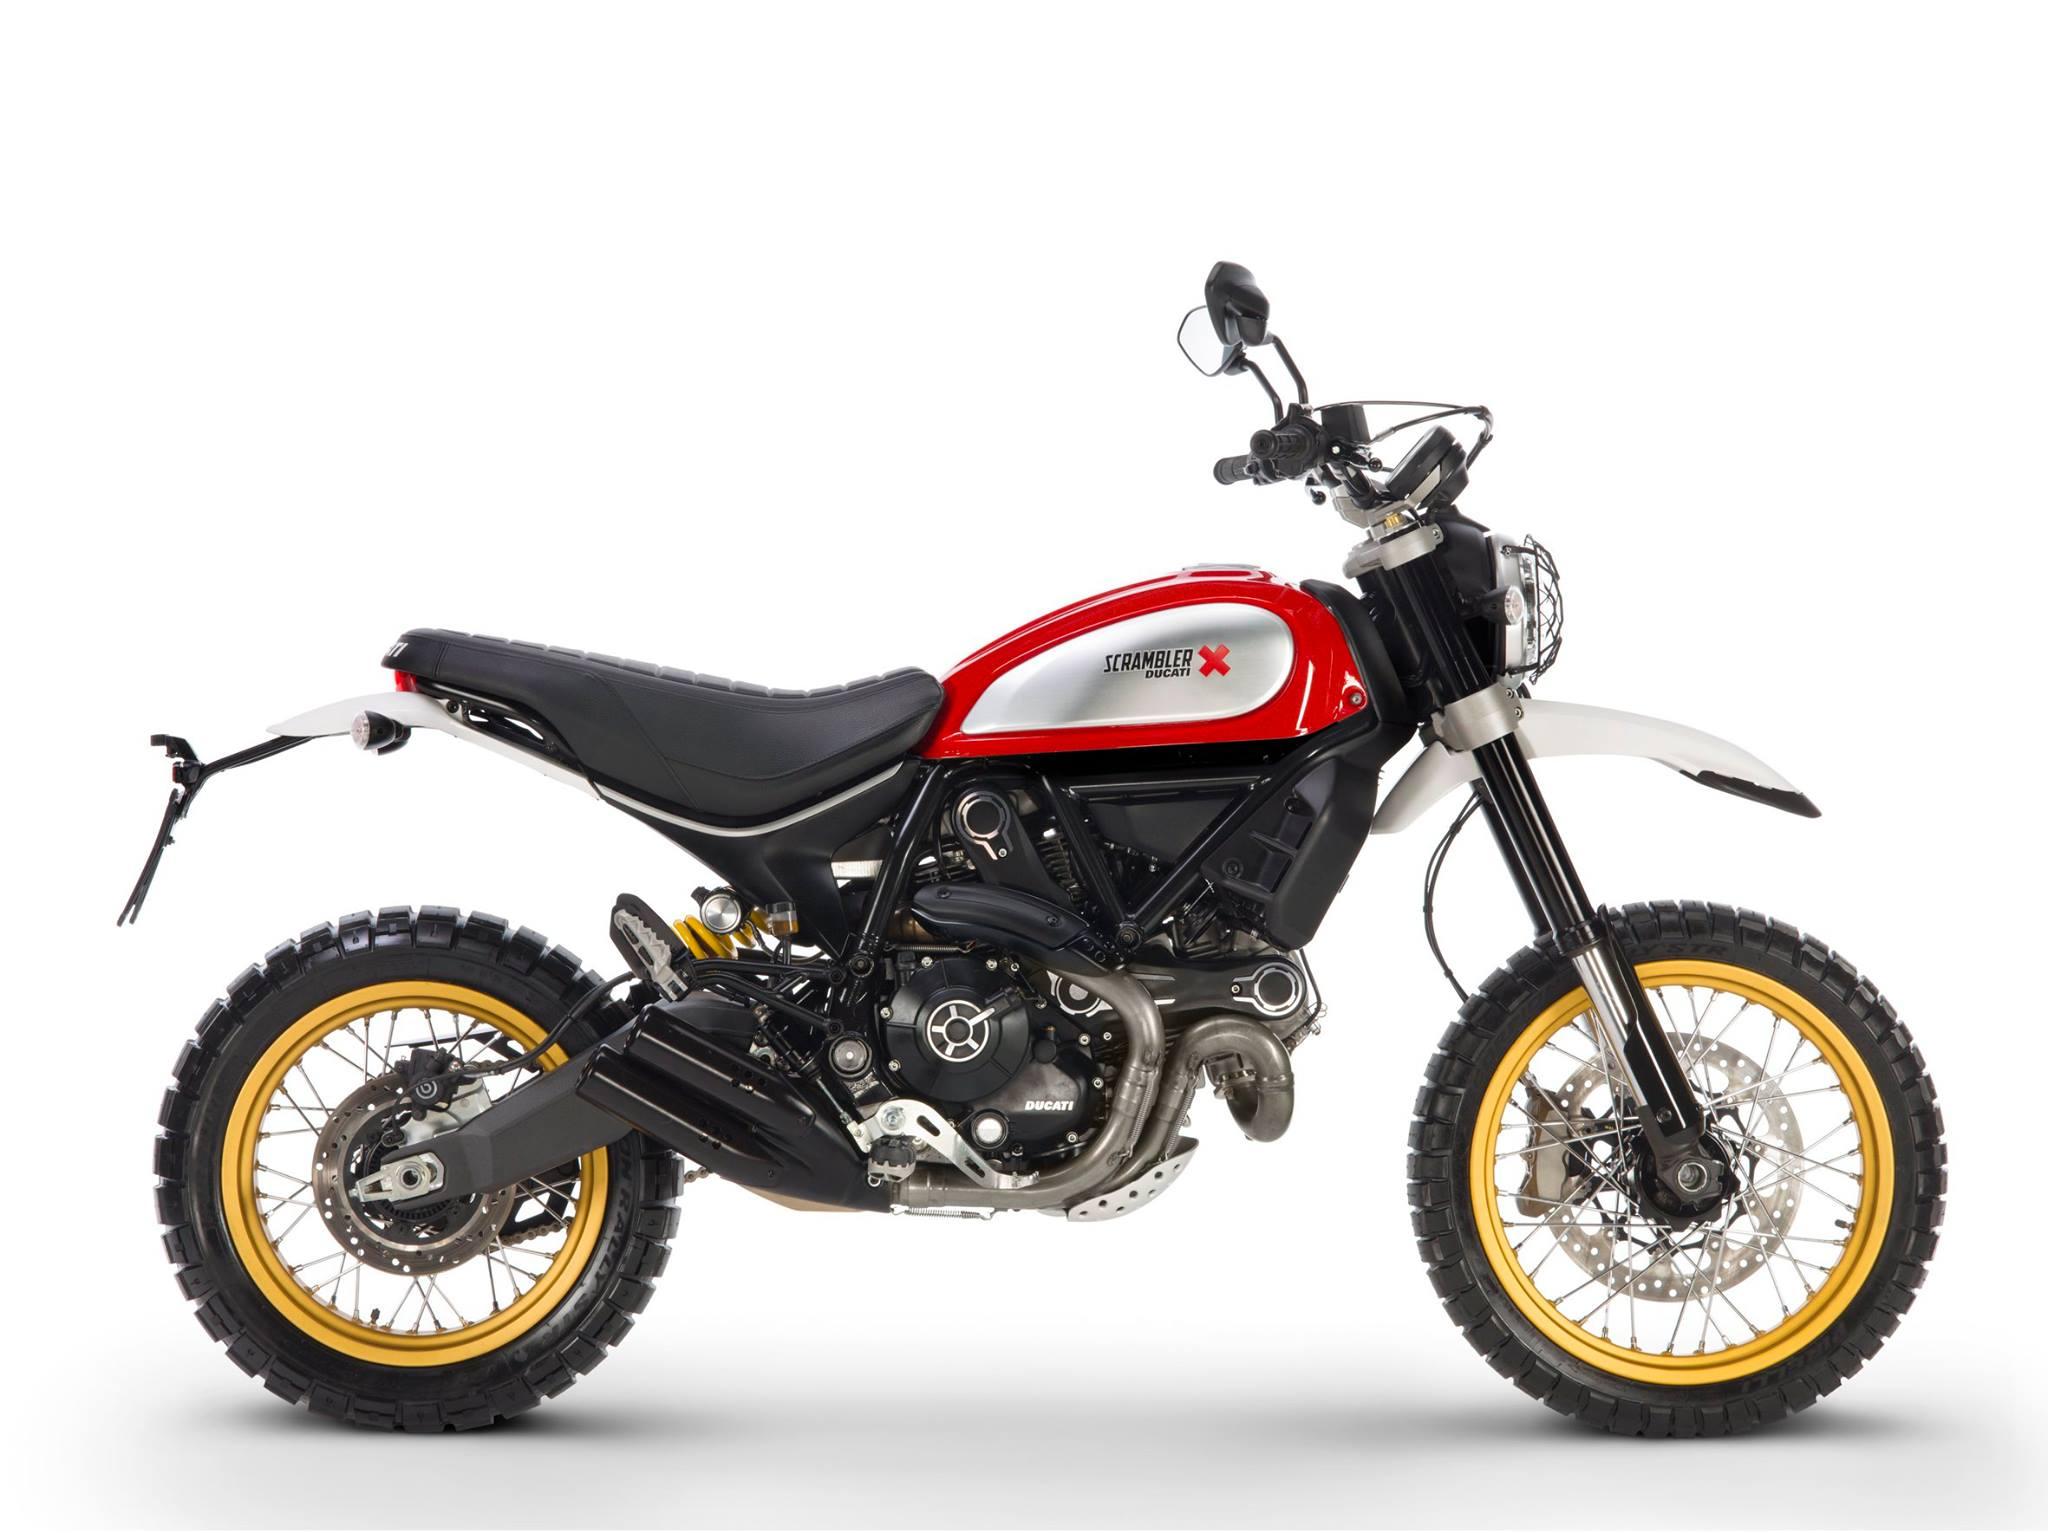 ducati_scrambler_desert_sled_motocyklicznie